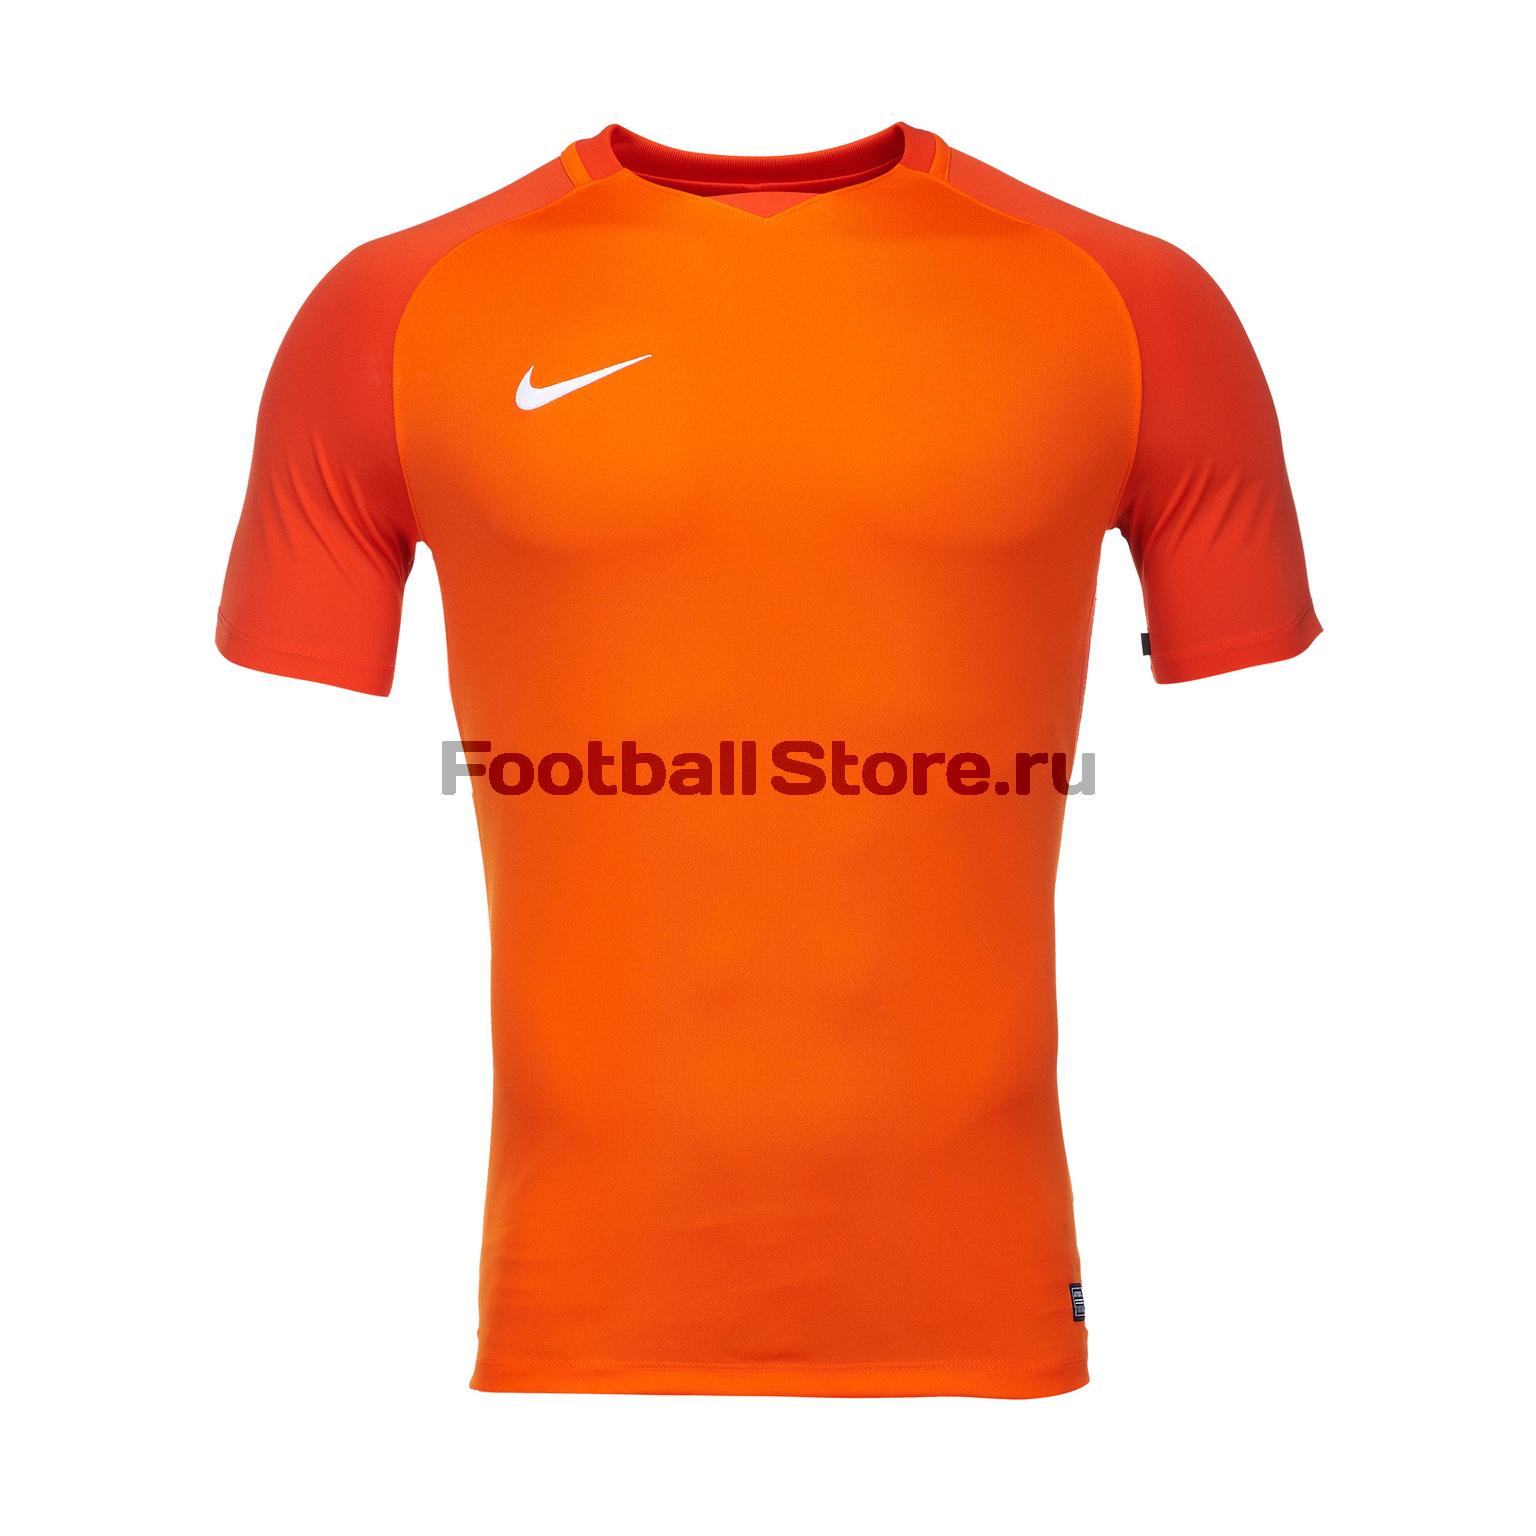 Футболки Nike Футболка игровая Nike Trophy III 881483-815 игровая форма nike футболка детская nike ss precision iii jsy boys 645918 410